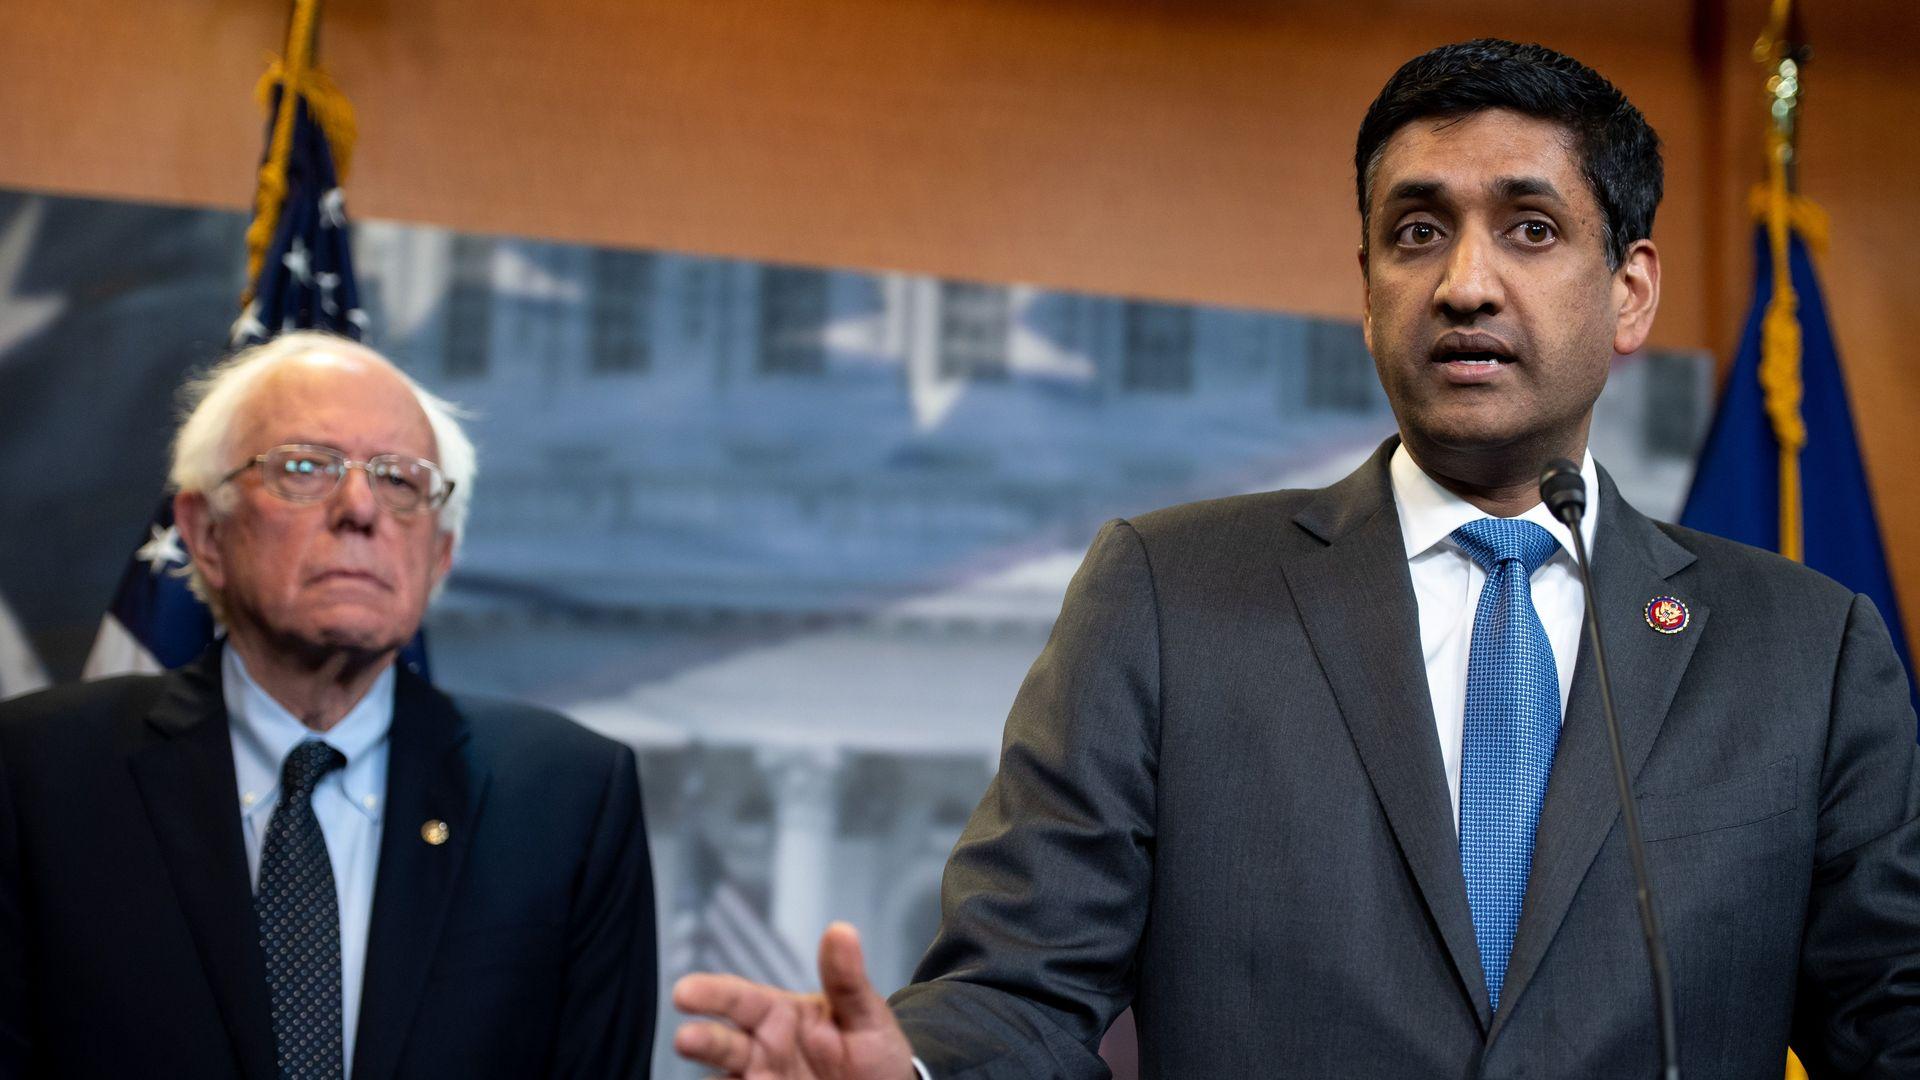 Ro Khanna with Bernie Sanders